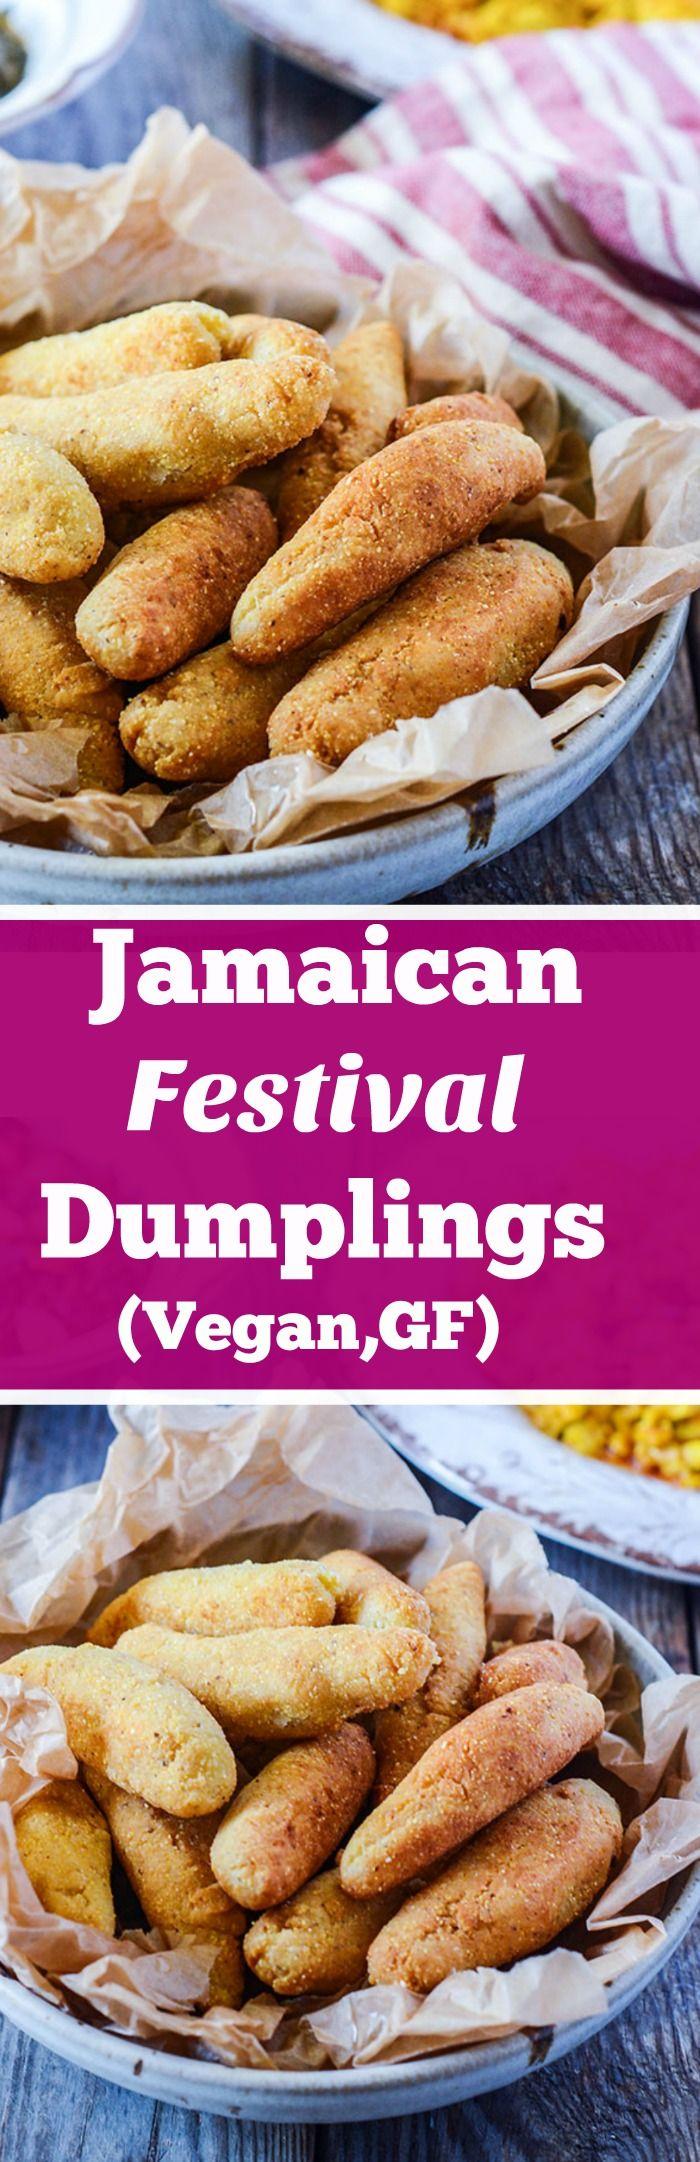 Jamaican Festival Dumplings Vegan, Gluten-Free